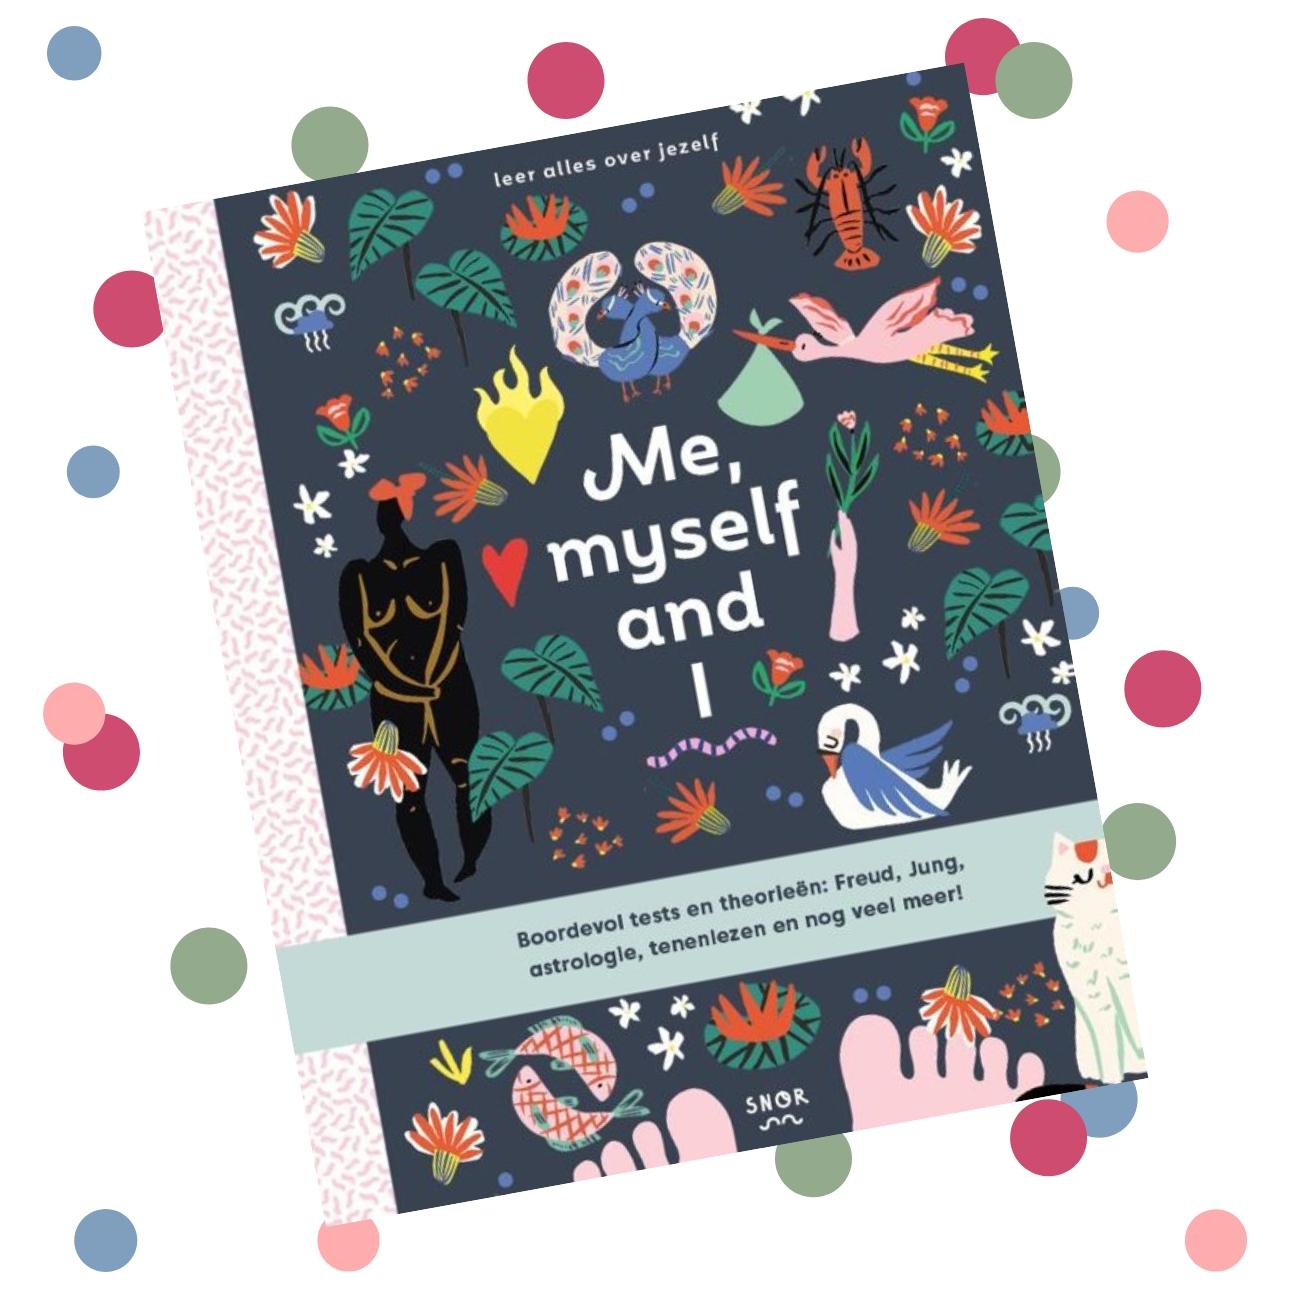 dagboeken wishlist - me myself and i boek